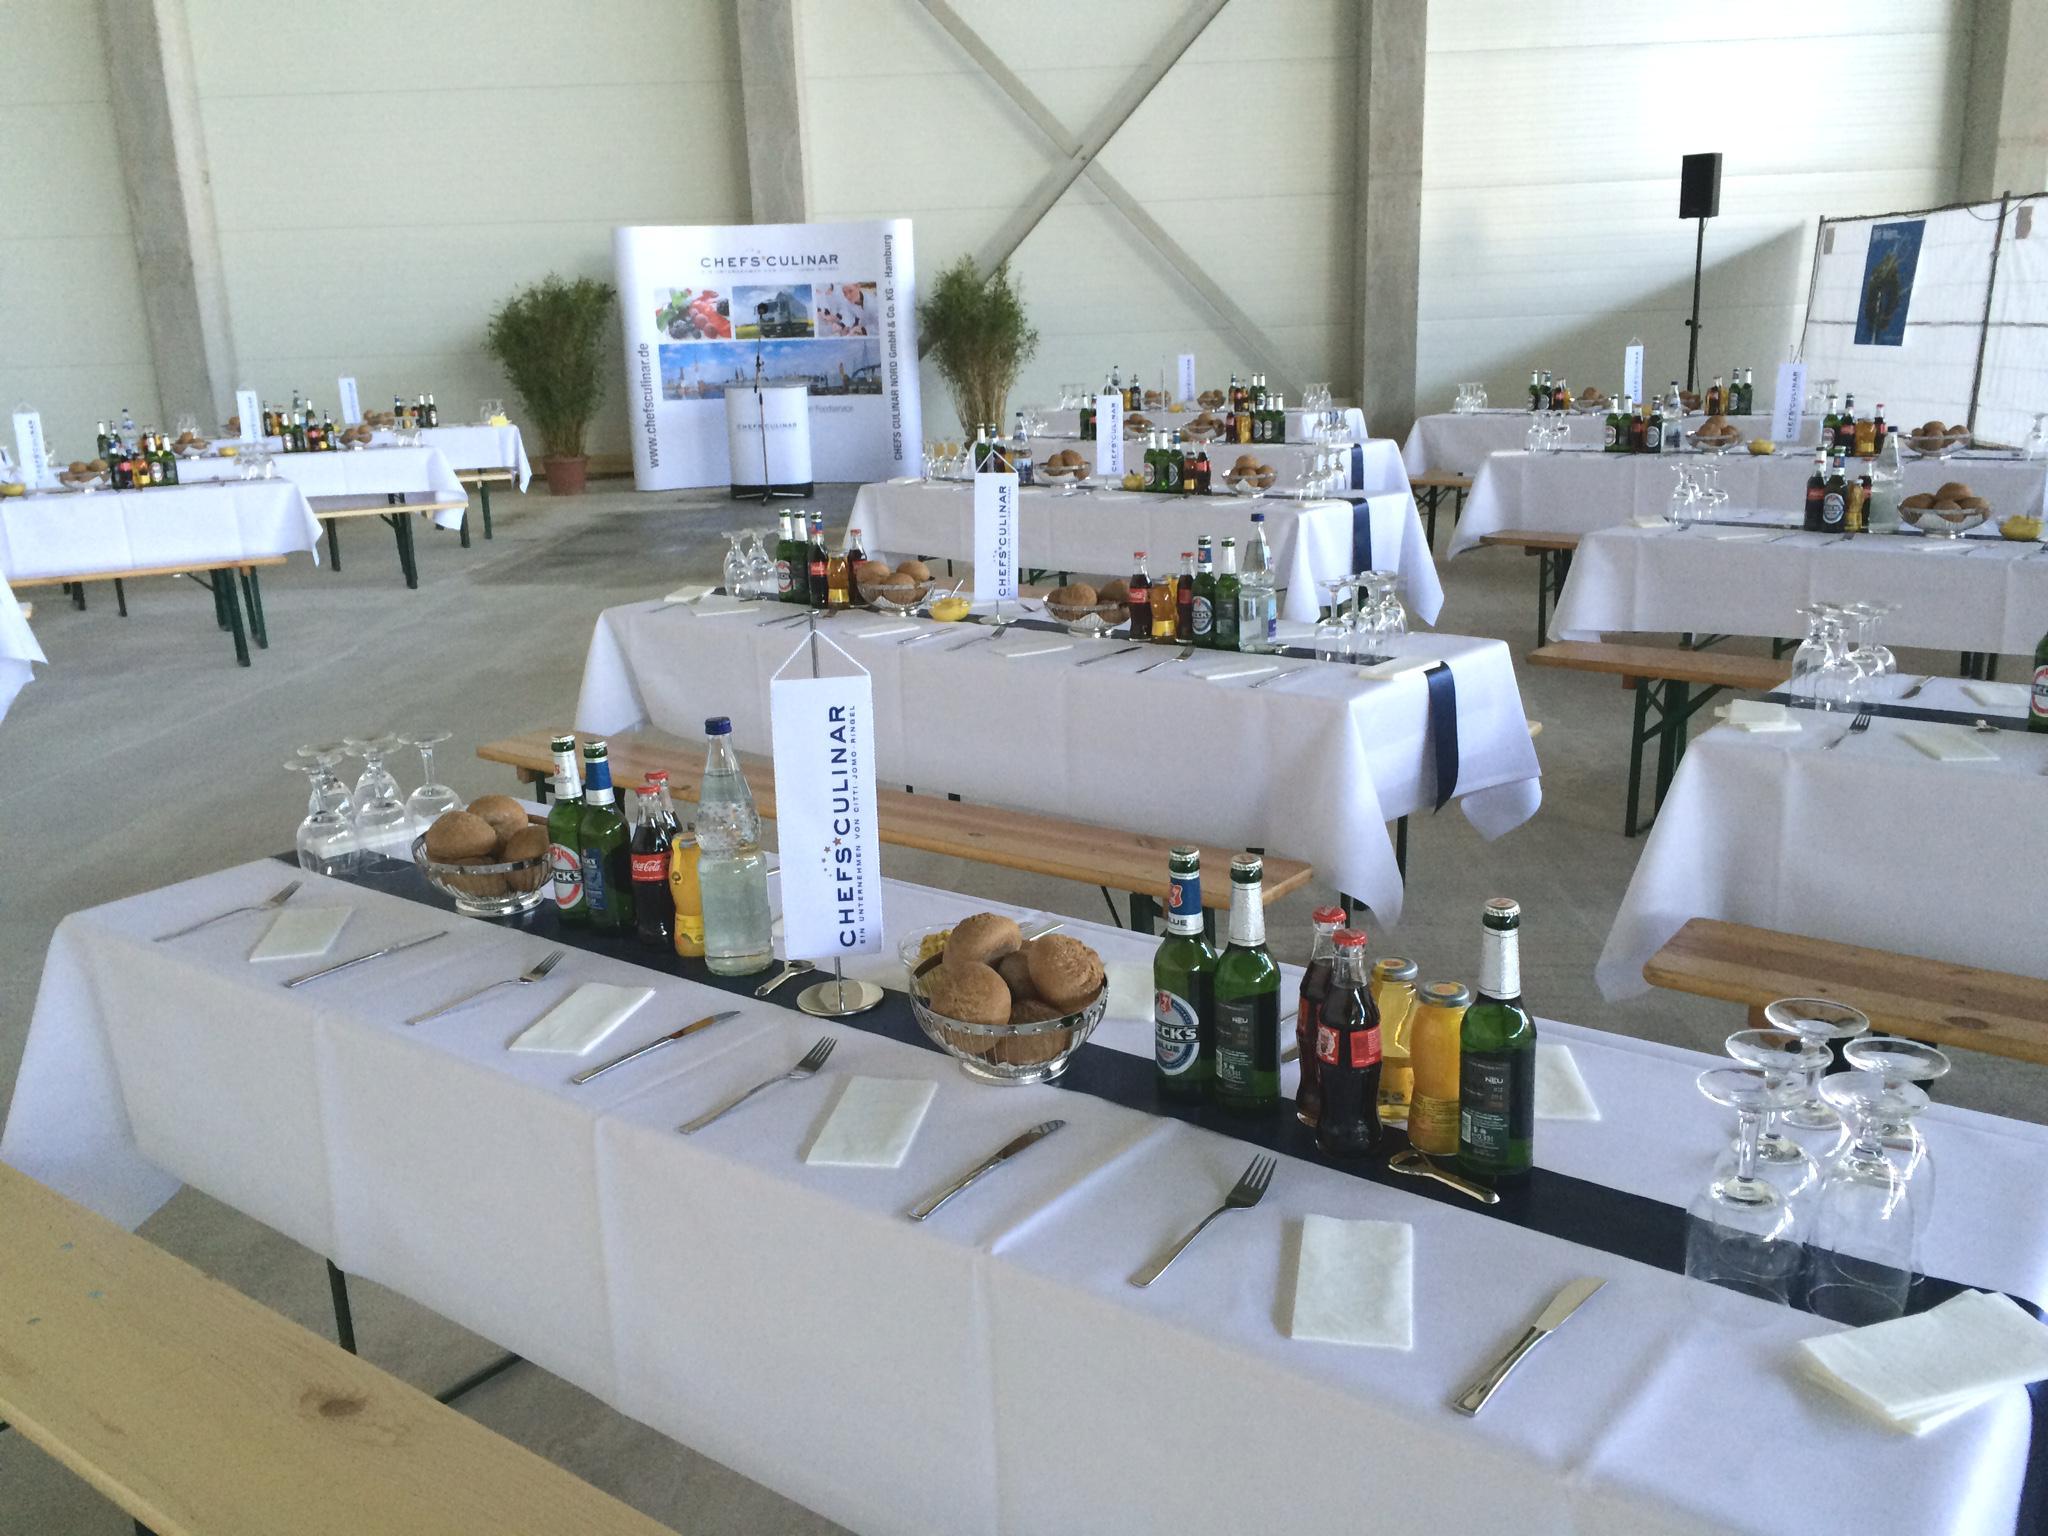 Event gaby l wel eventmanagement - Richtfest deko ...